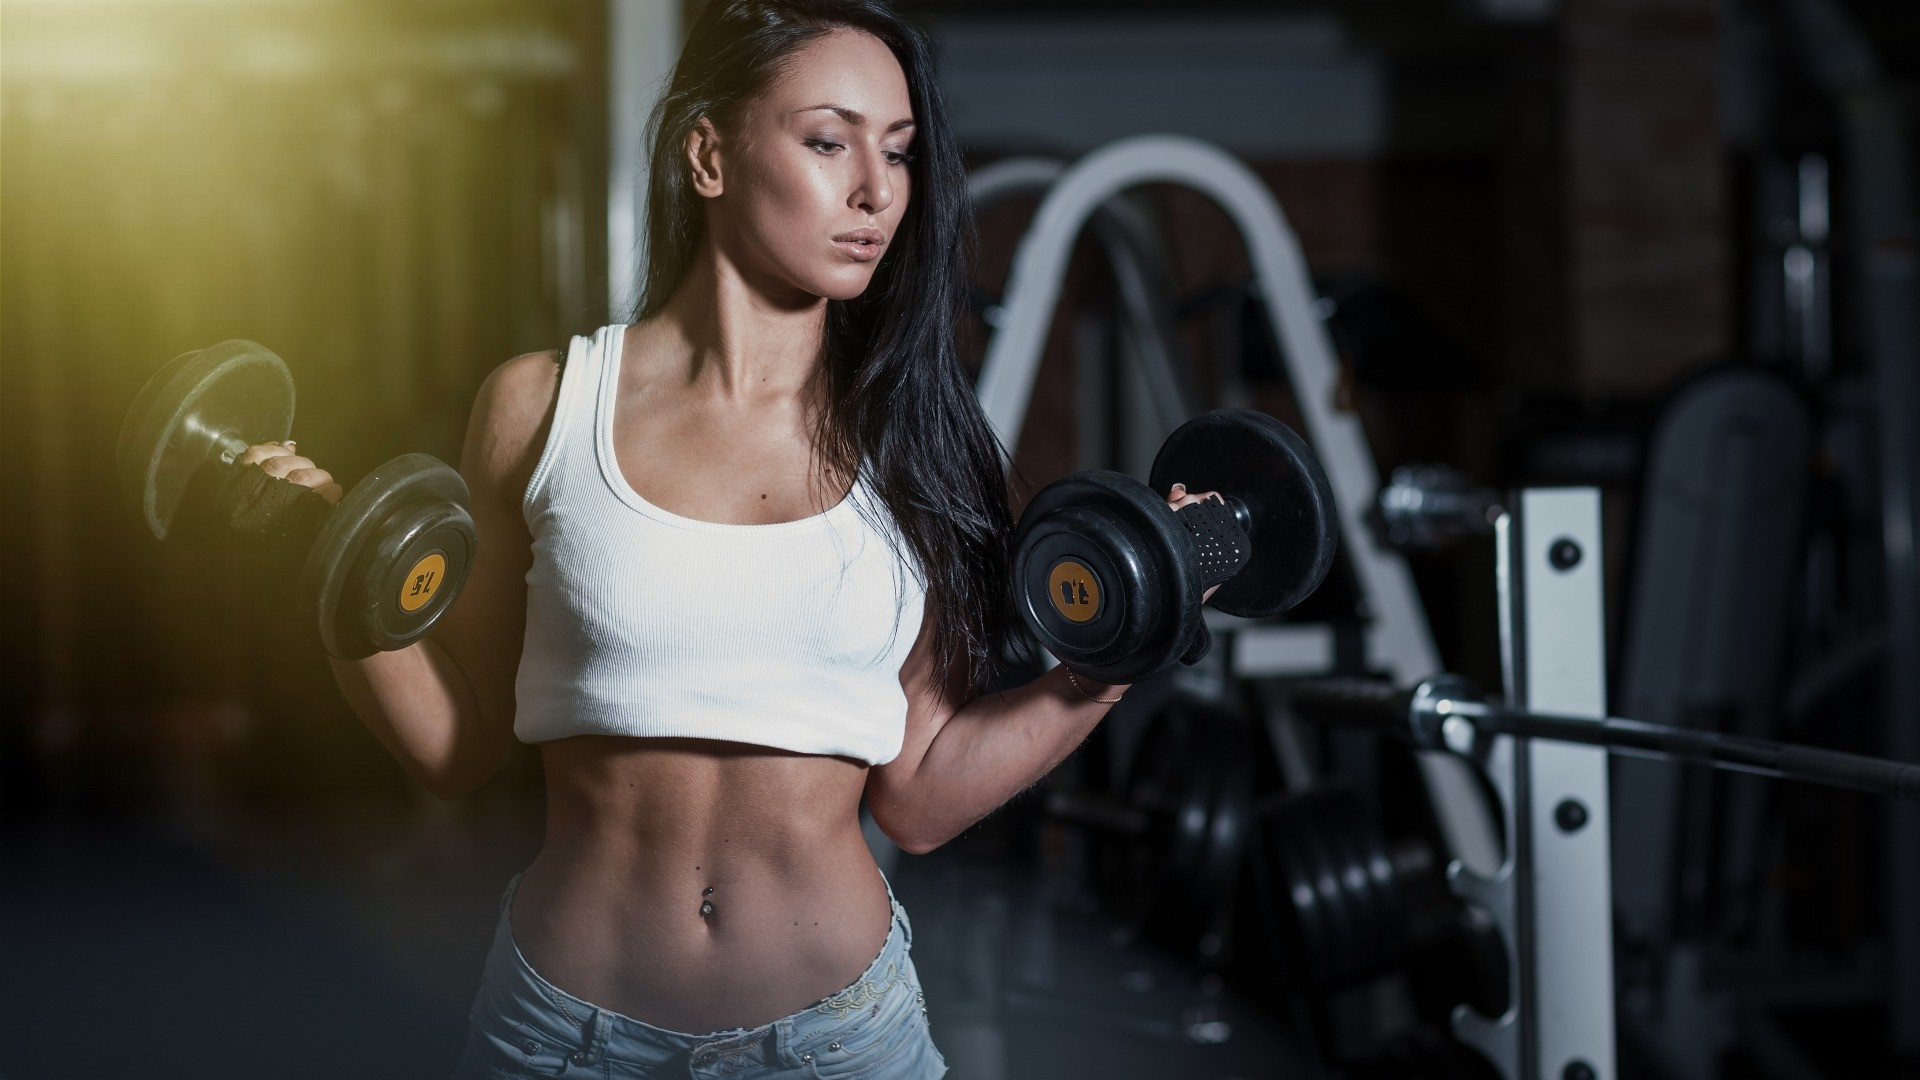 Fitness Wallpaper